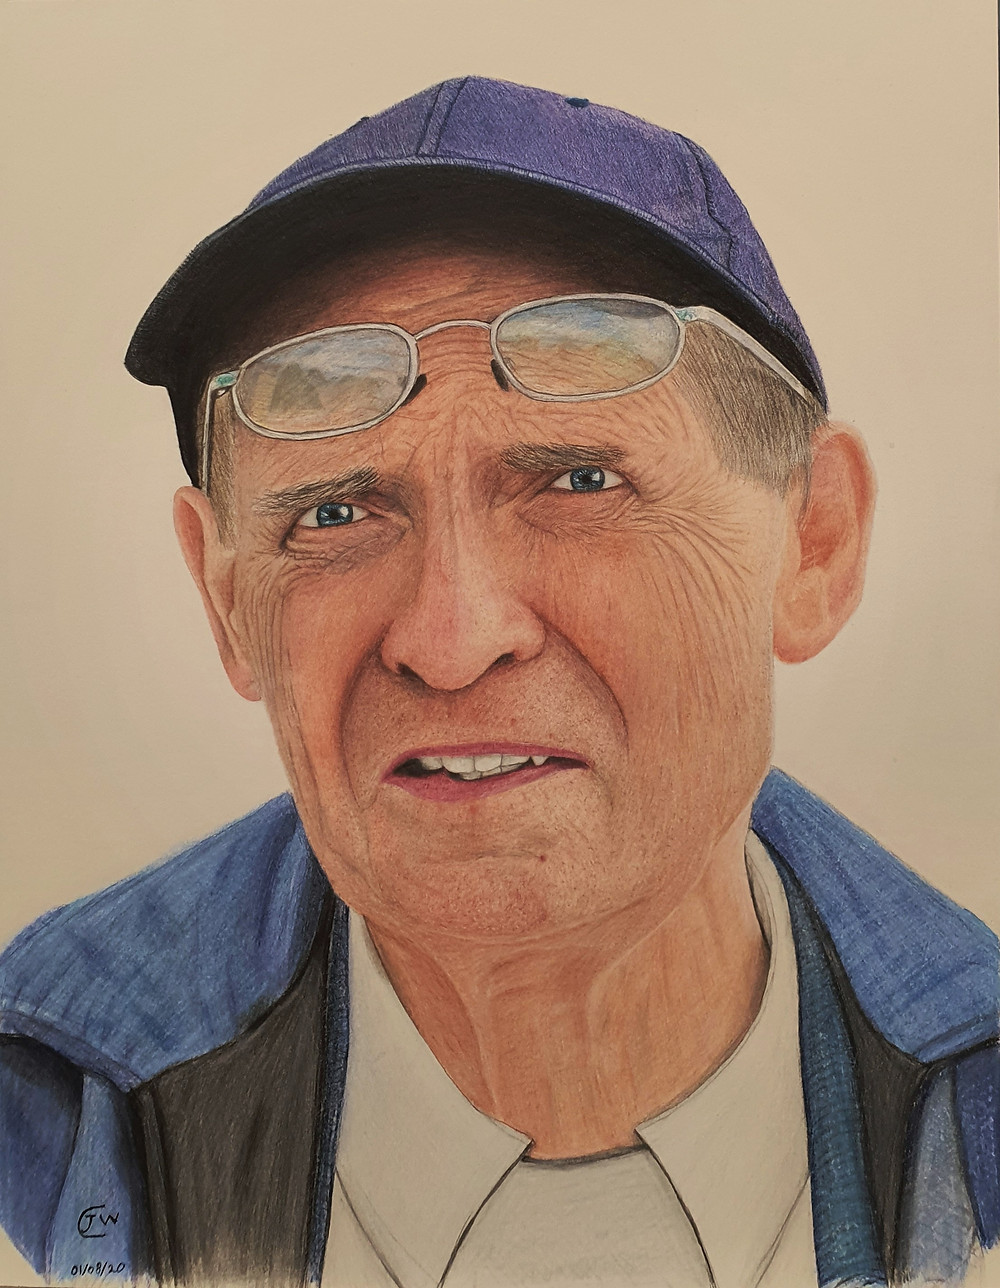 James Carter Art Realism Portrait Drawing